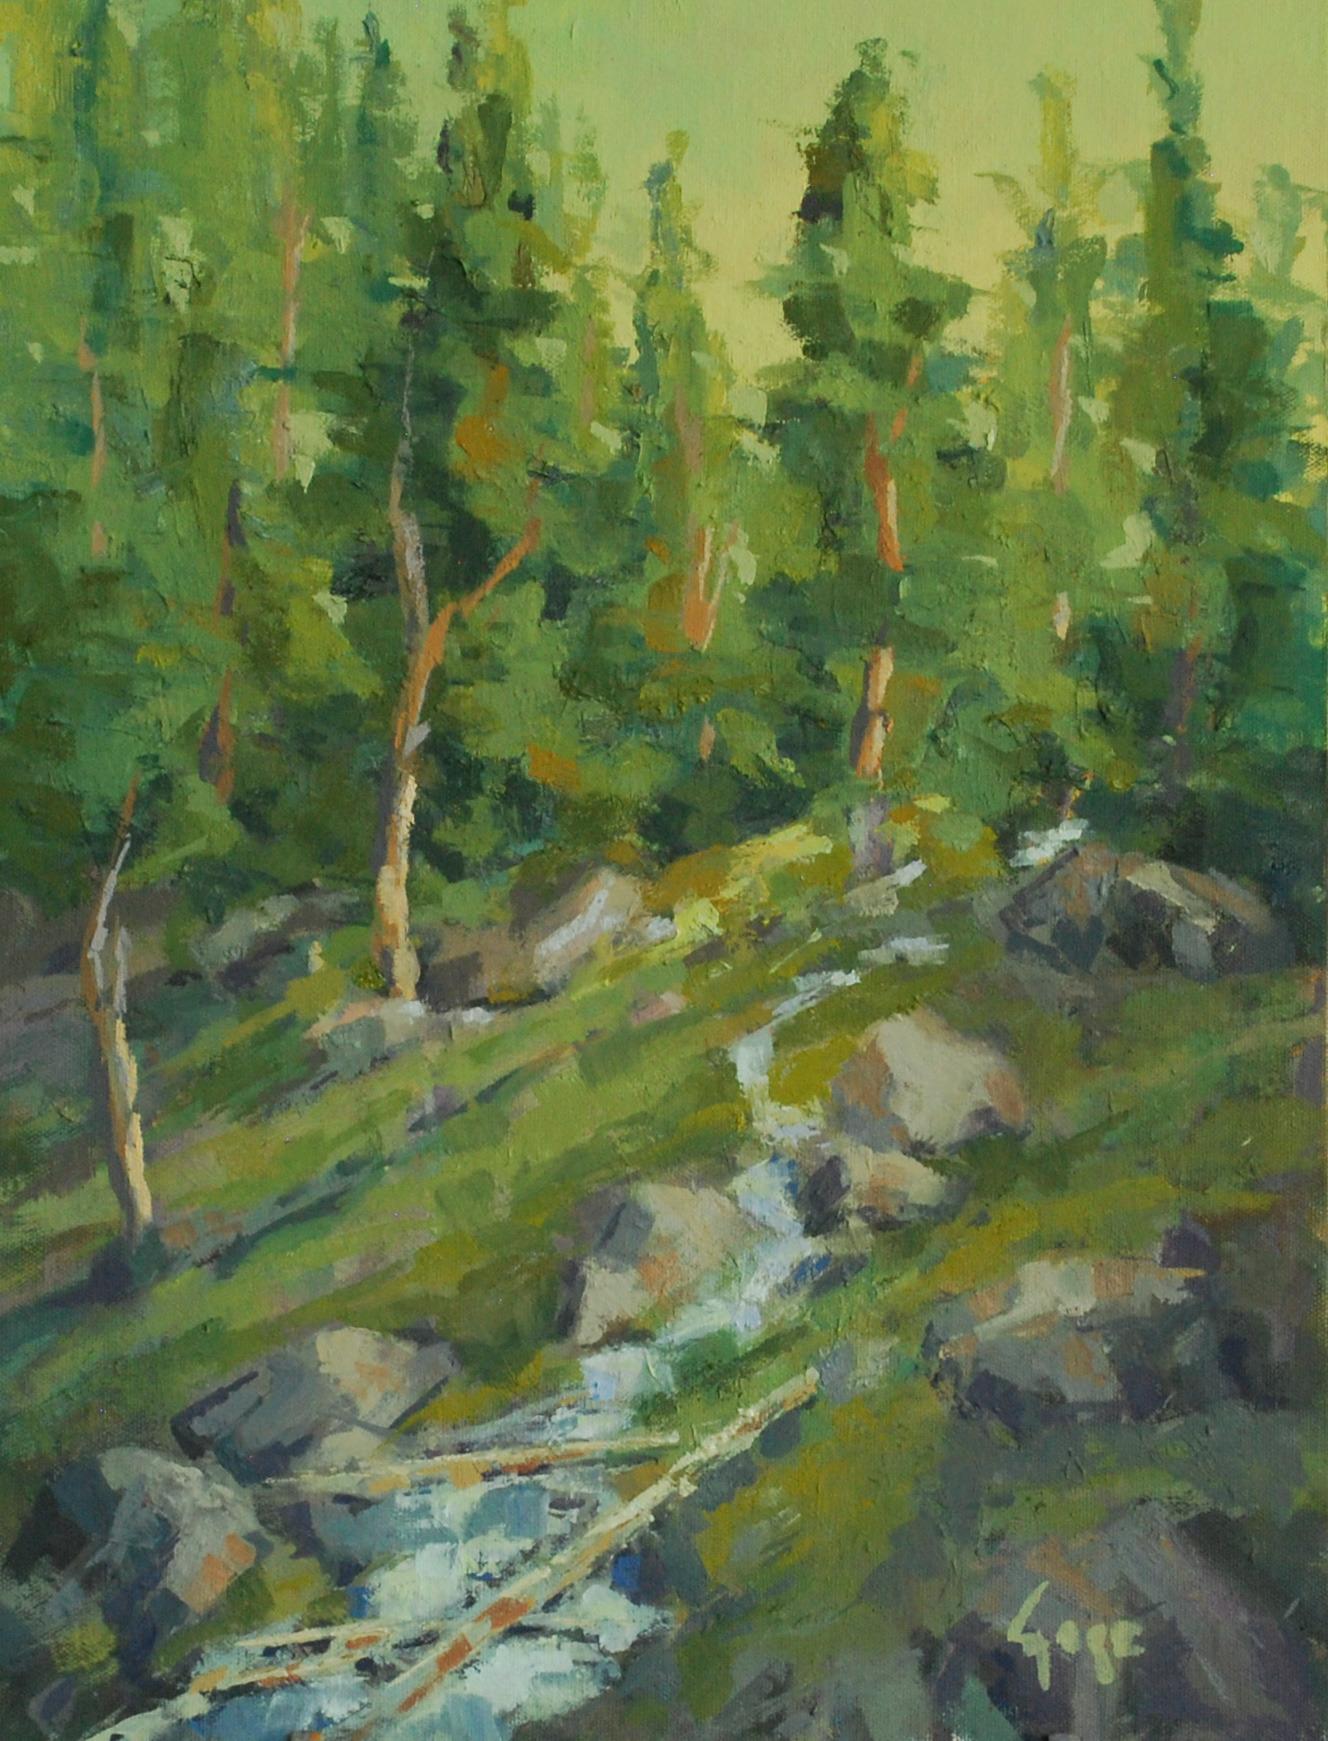 Spring runoff aenyzy